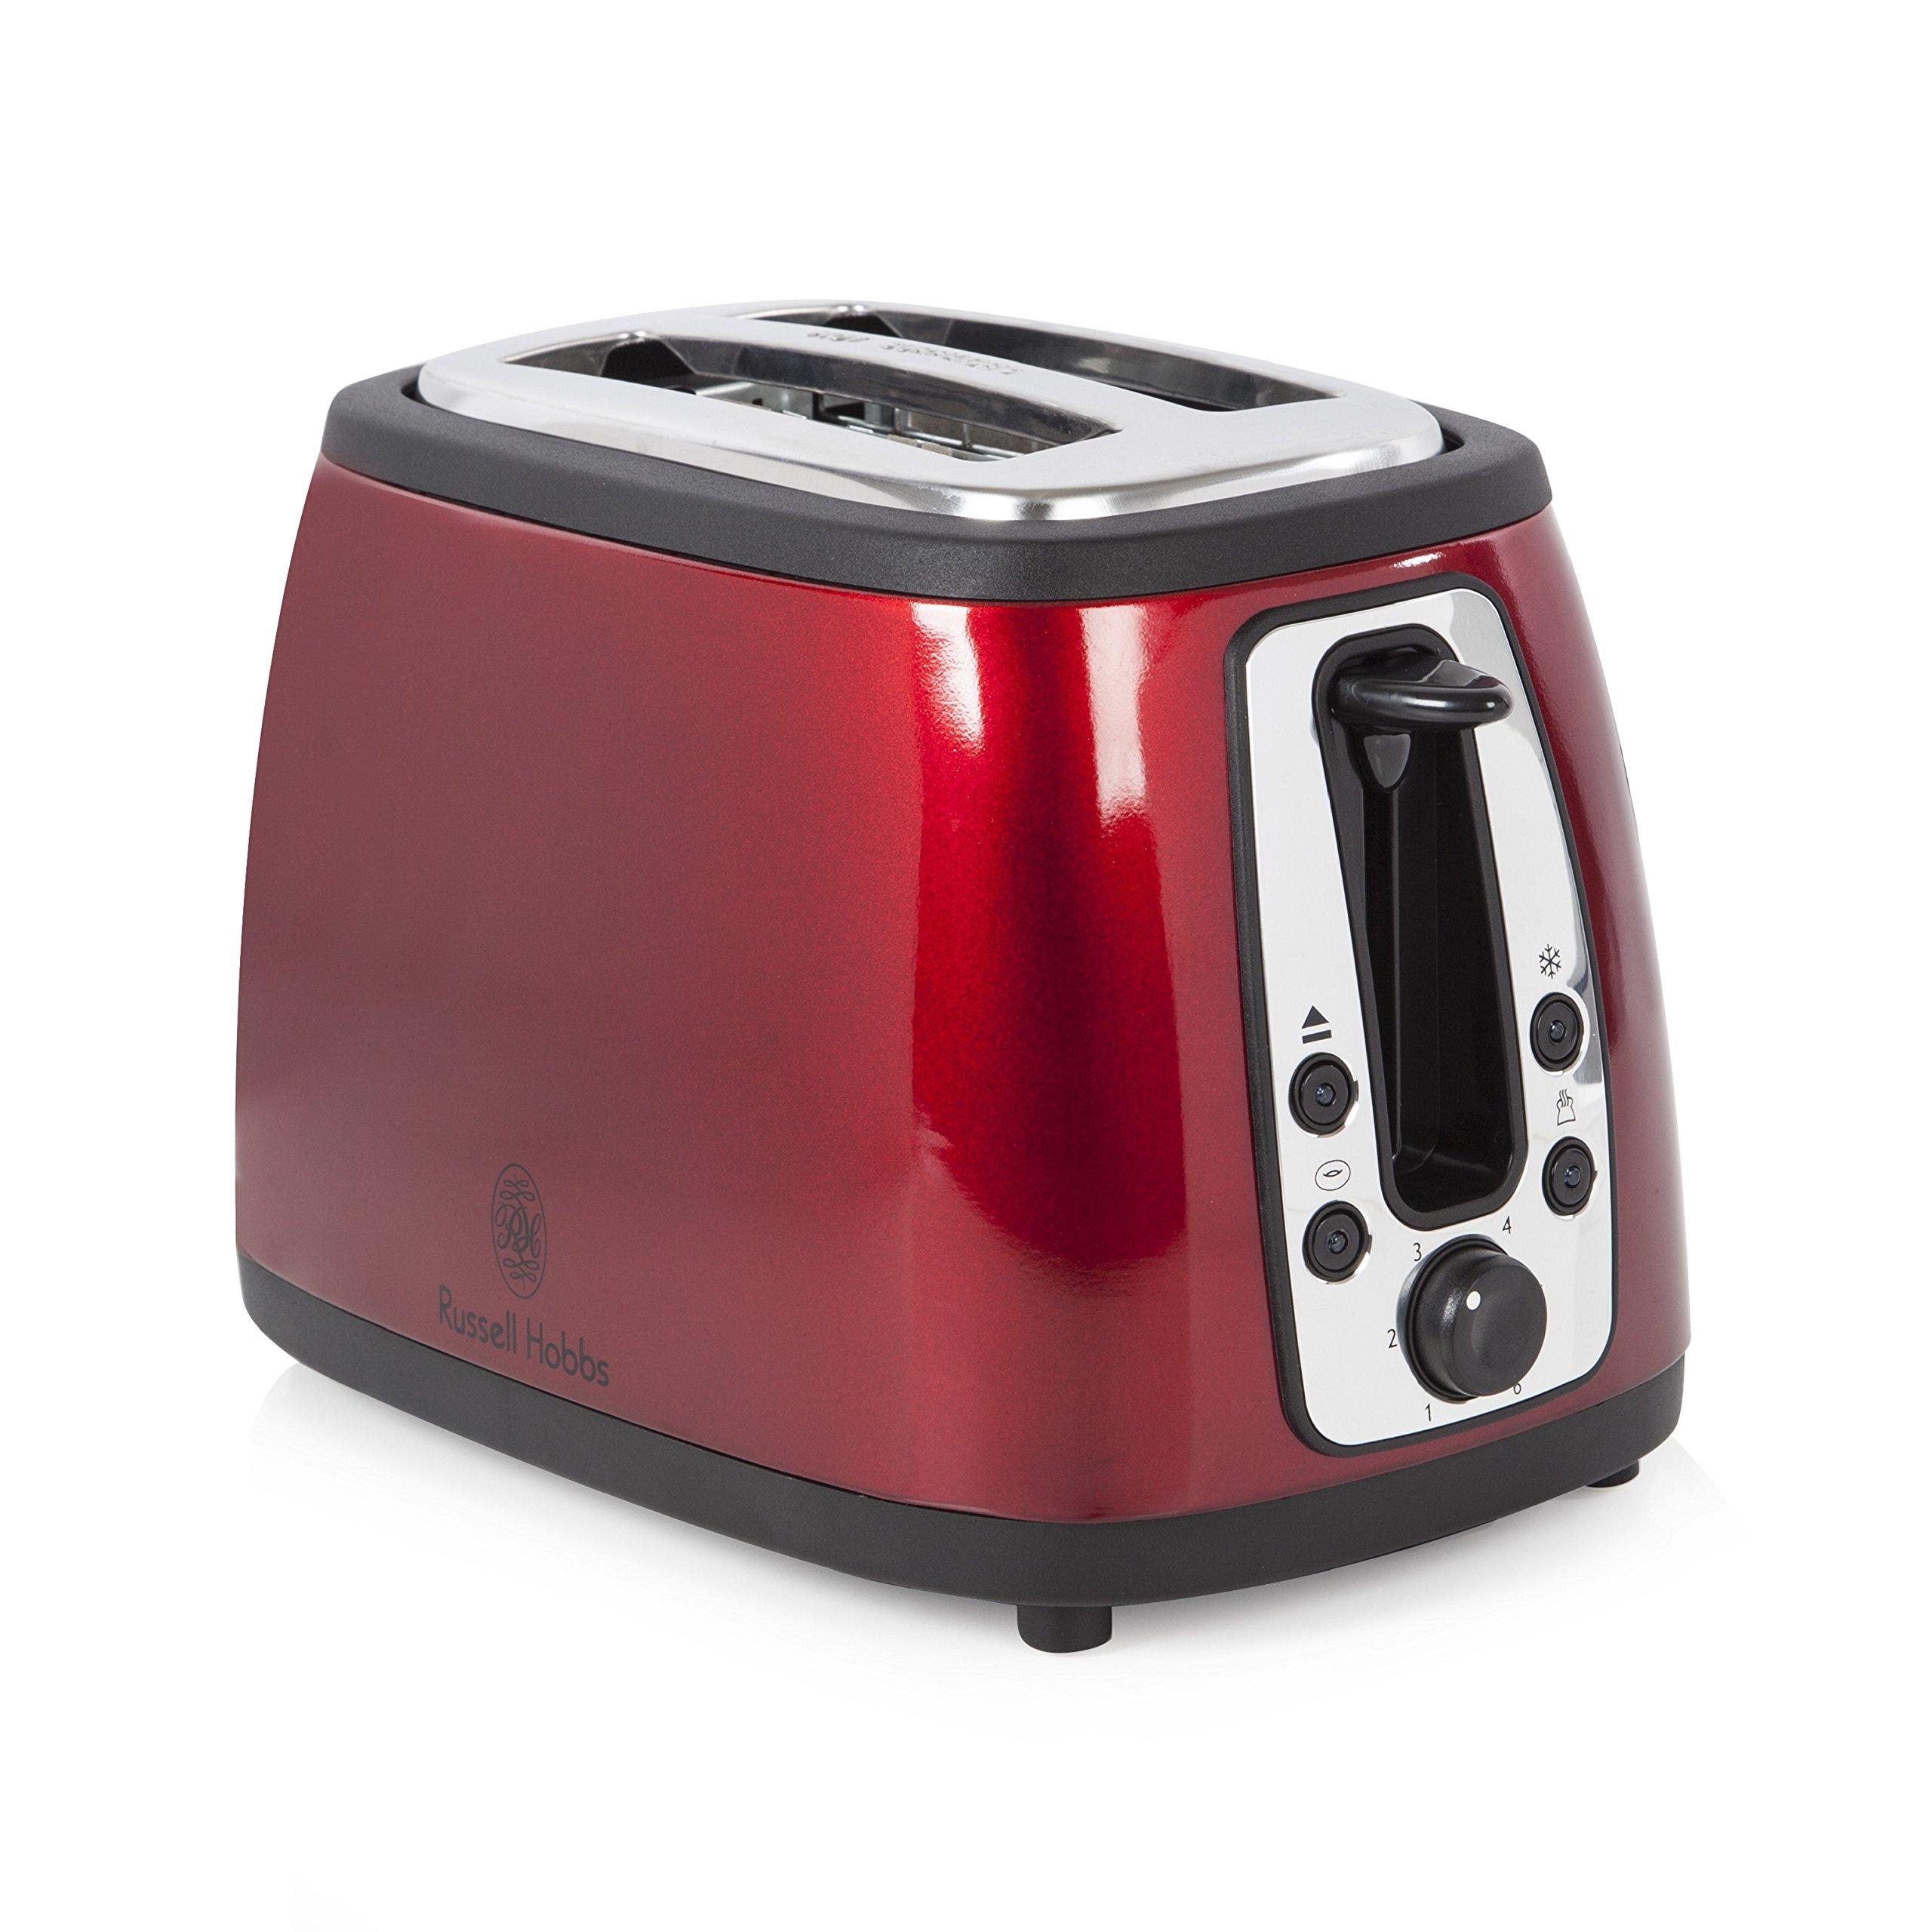 Russell Hobbs 19150 Heritage 2-Slice Toaster - Metallic Red